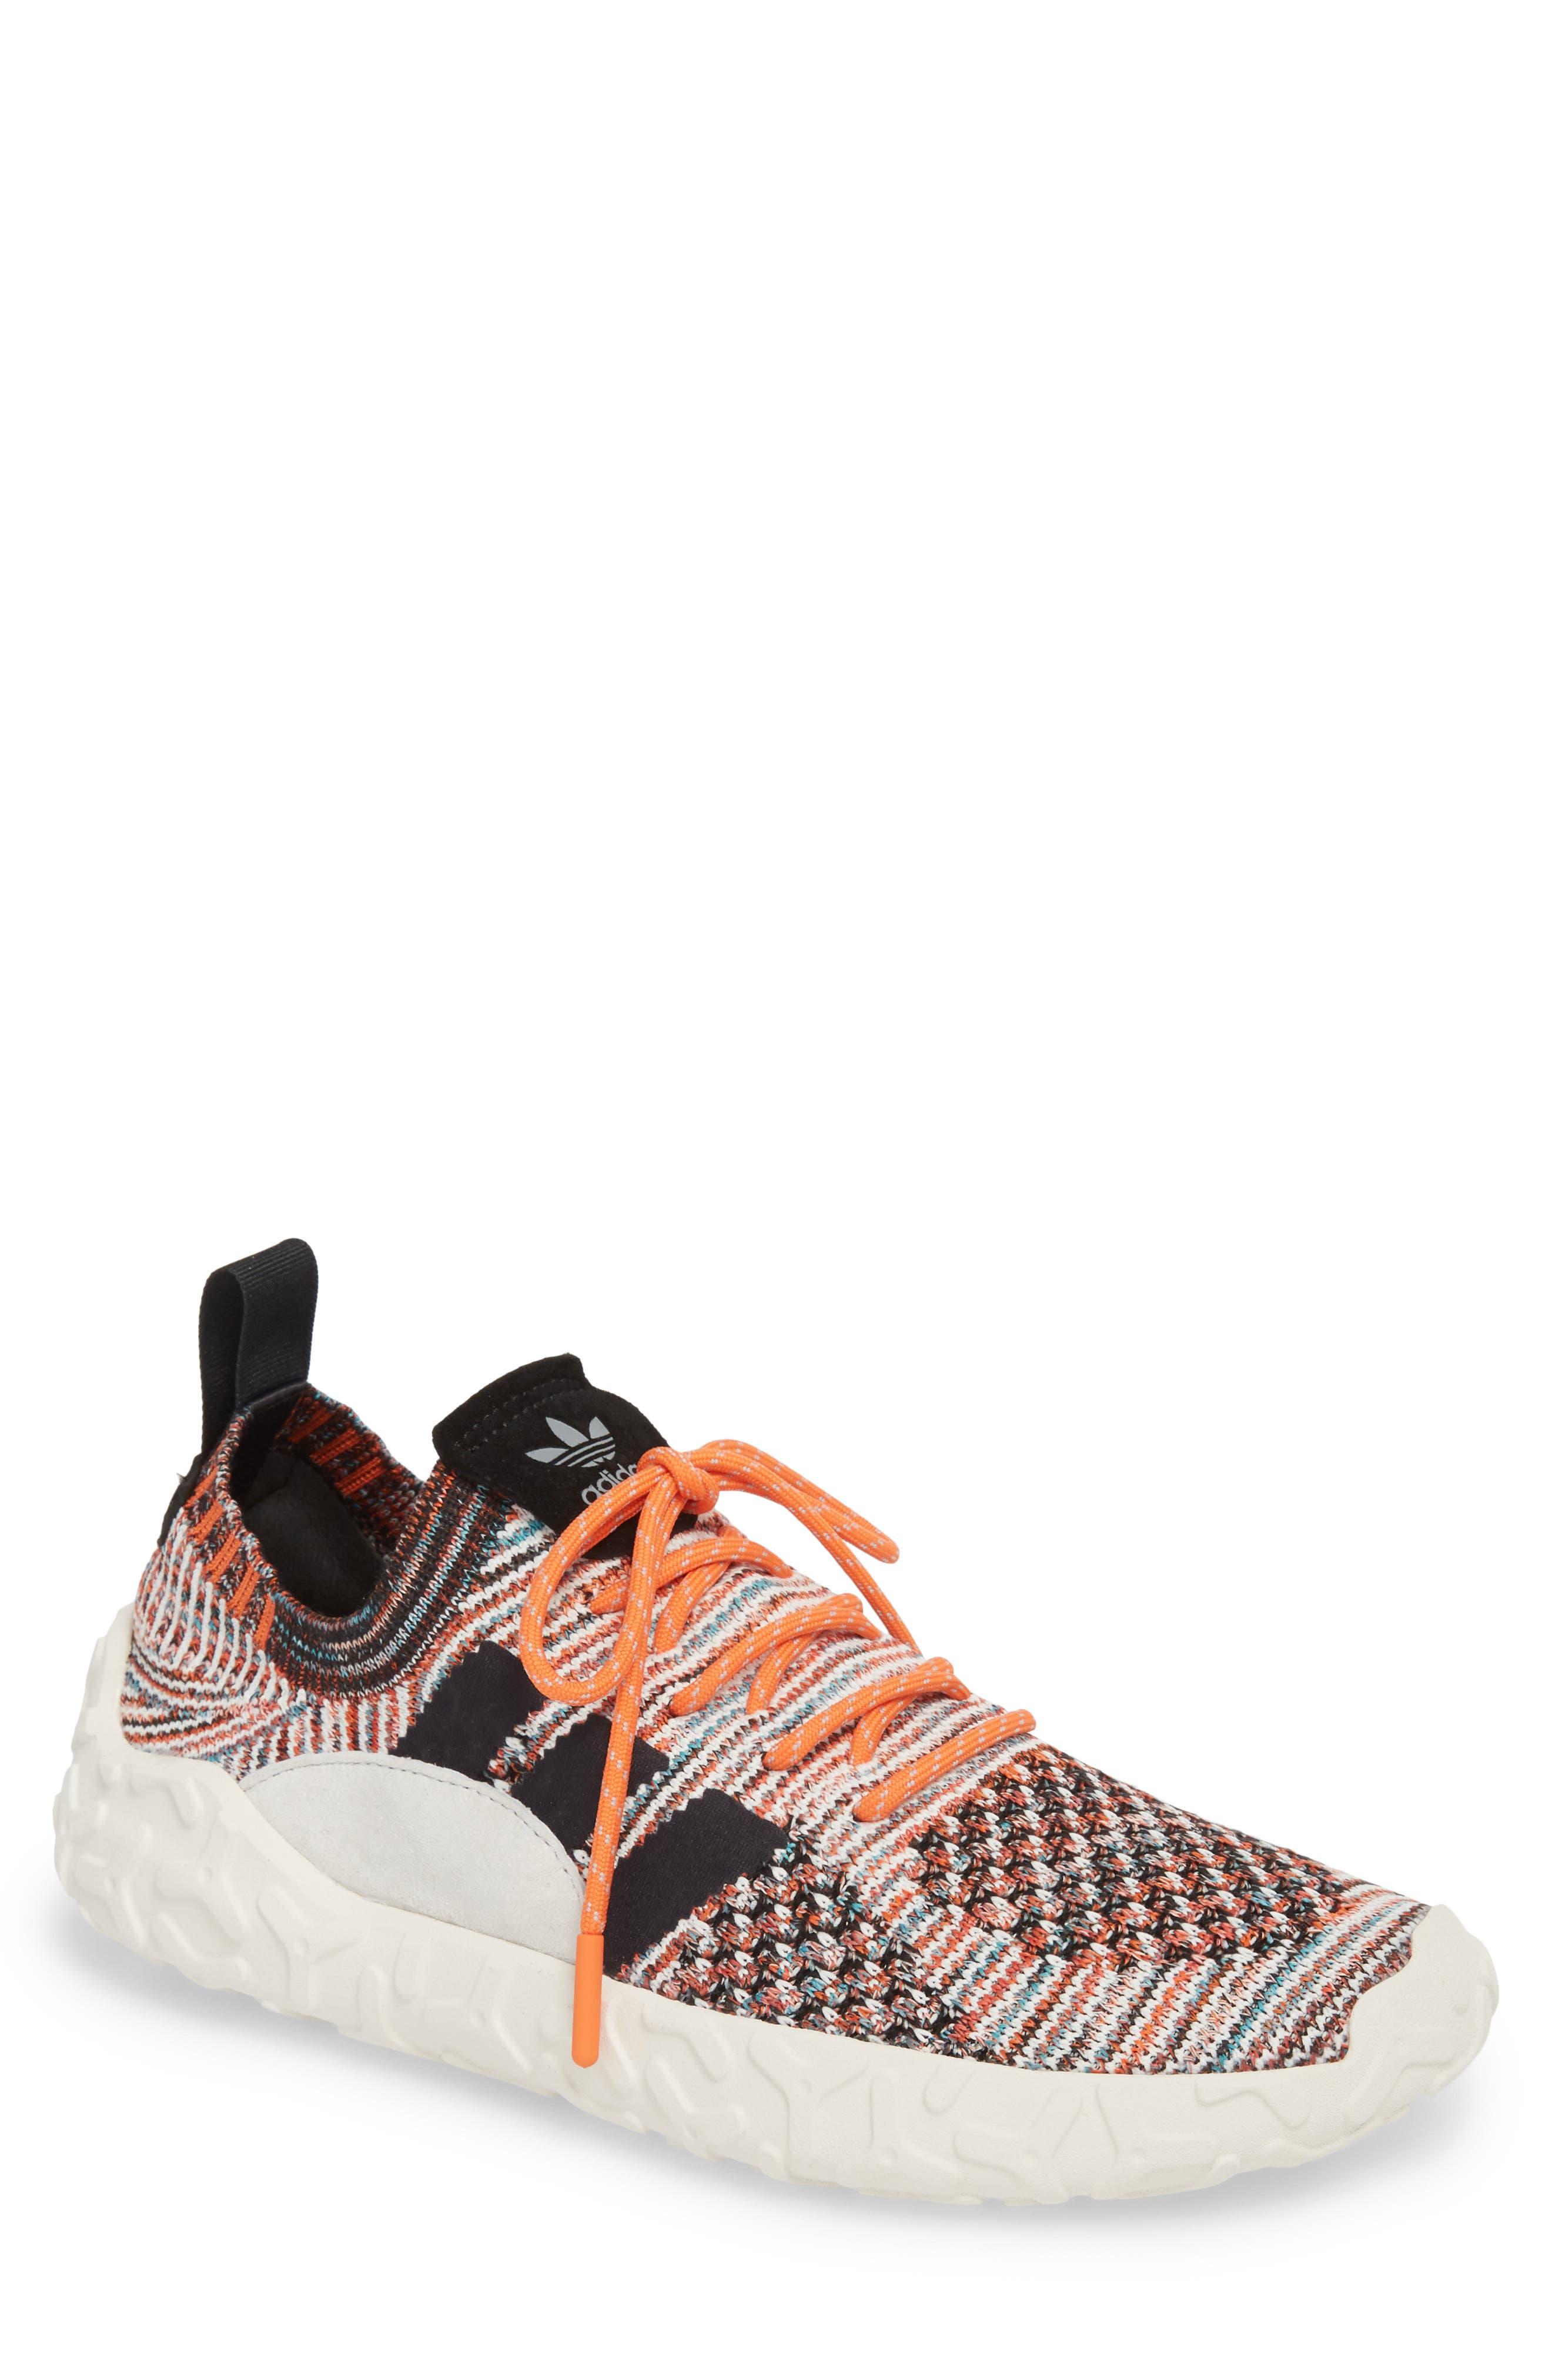 adidas F22 Primeknit Sneaker (Men)